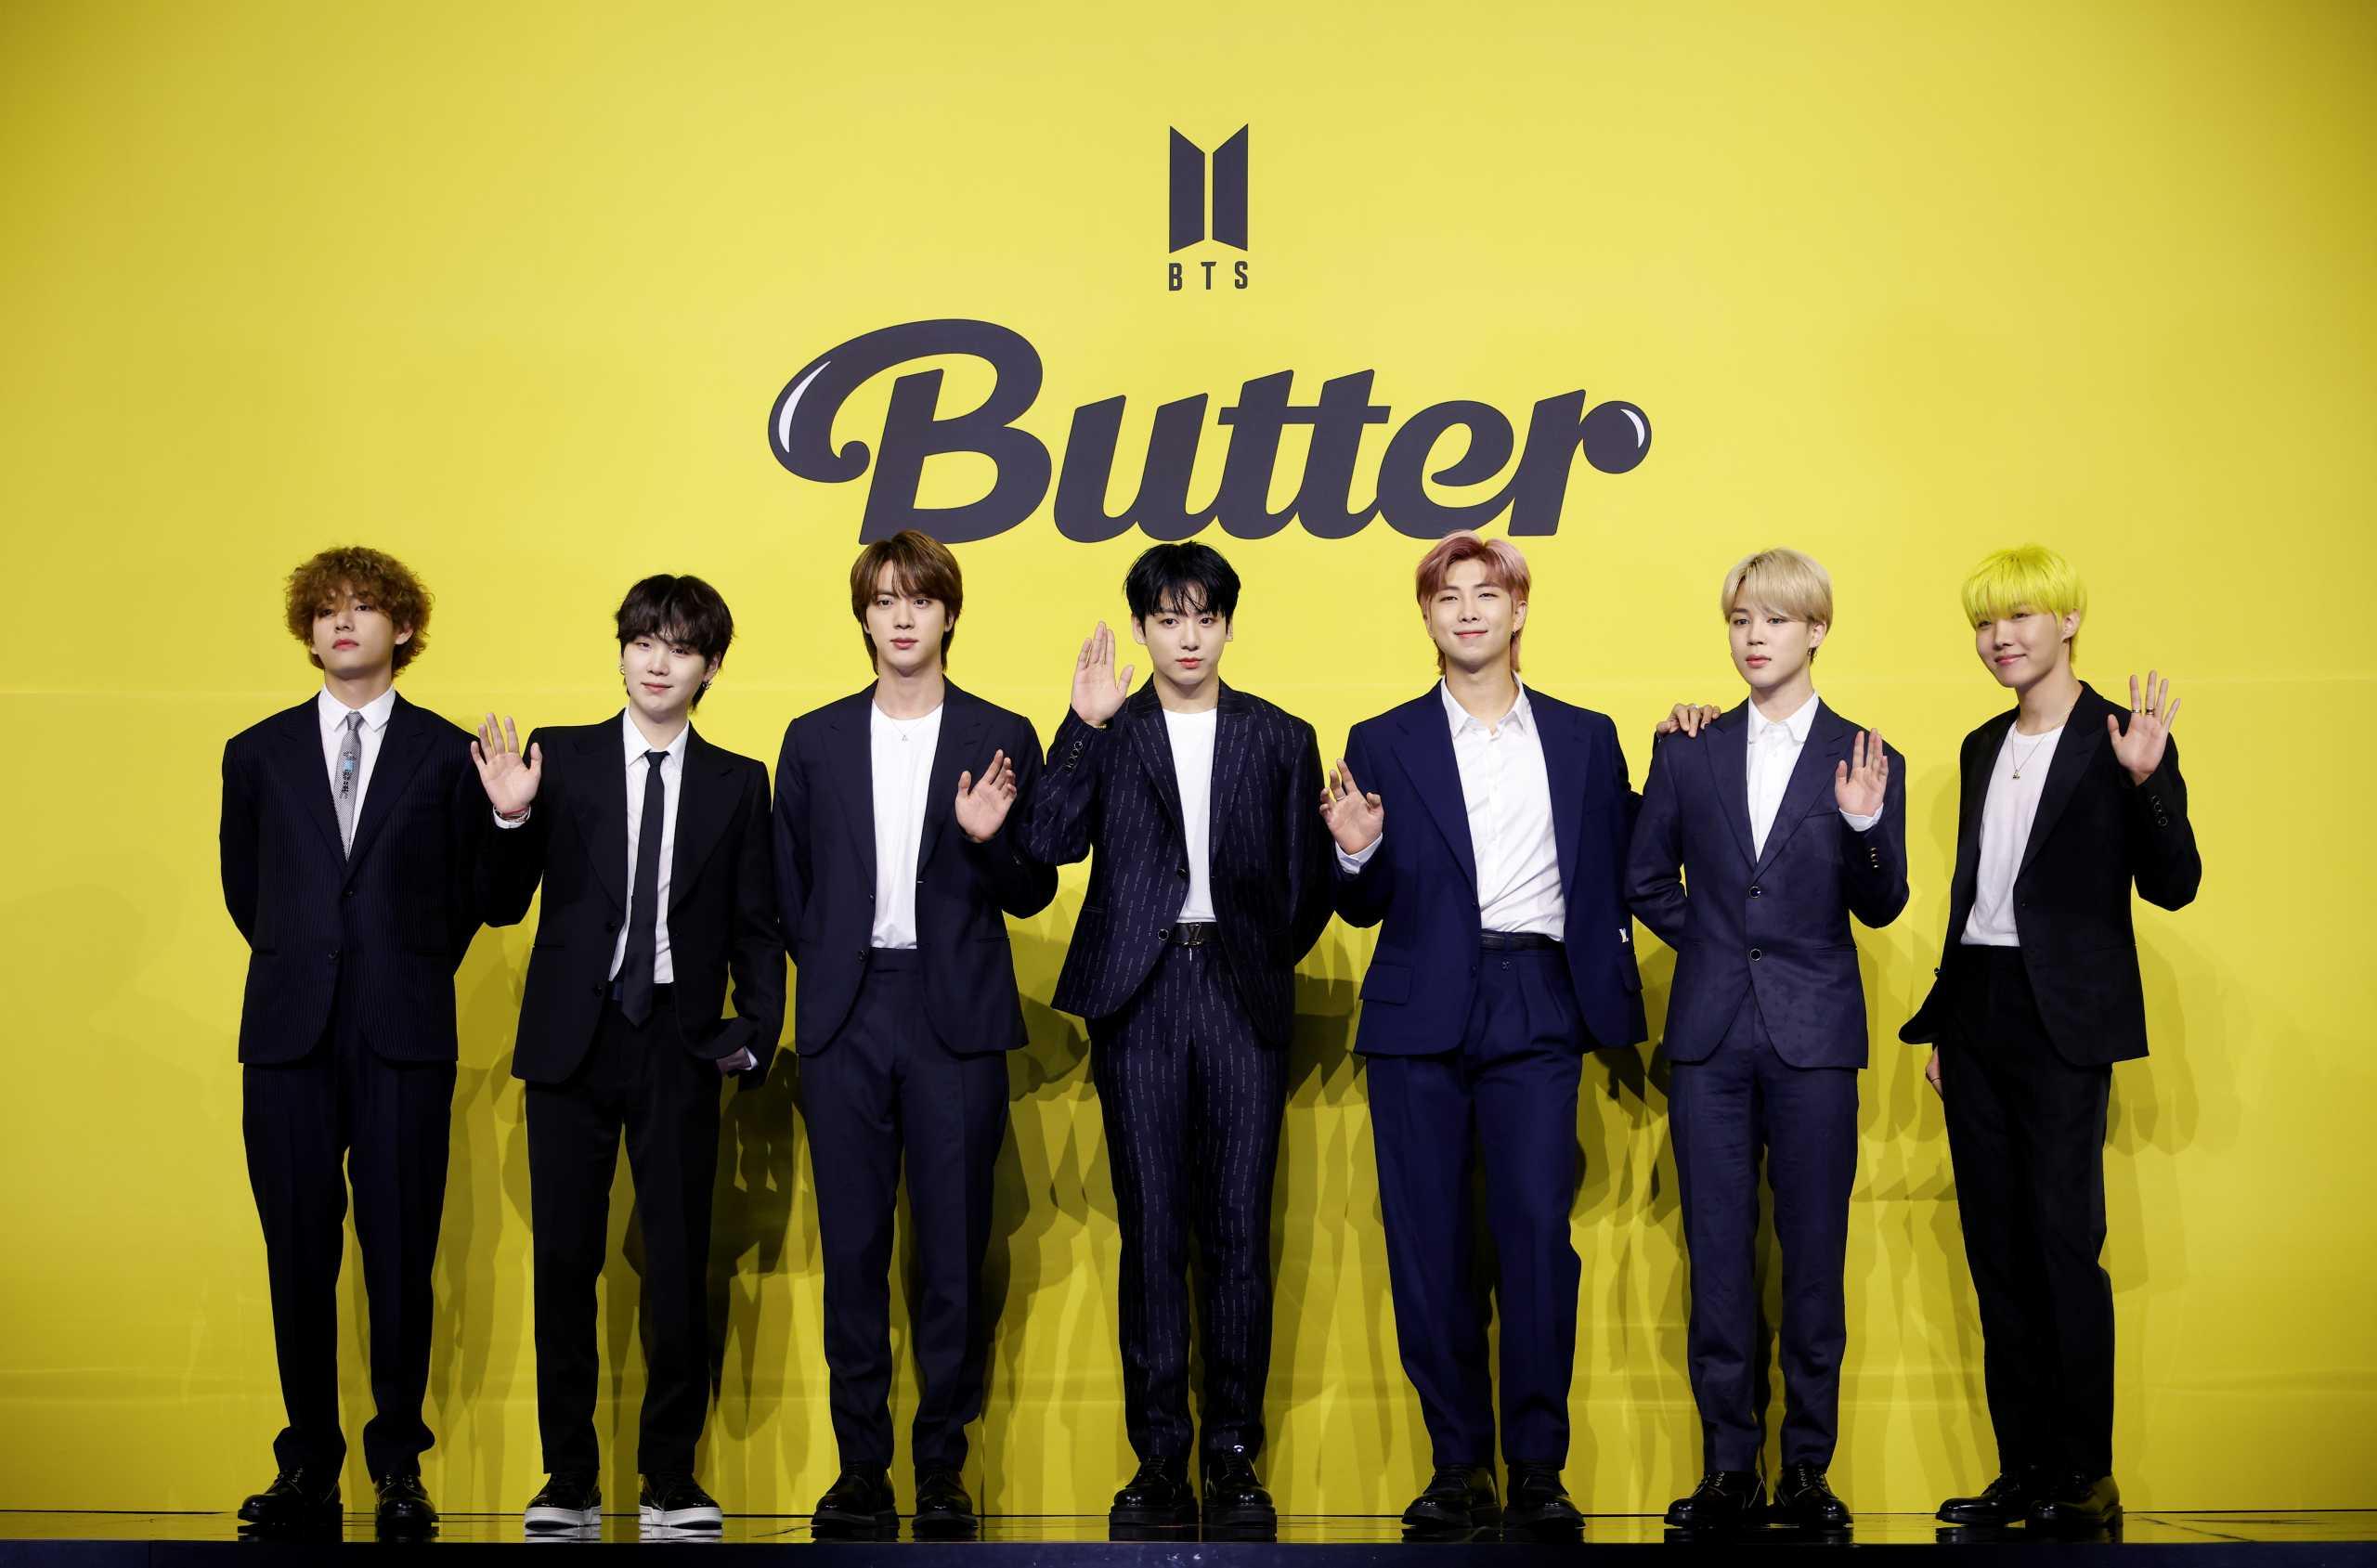 To νέο τραγούδι του νοτιοκορεάτικου συγκροτήματος BTS κατέρριψε το ρεκόρ στο YouTube Premiere